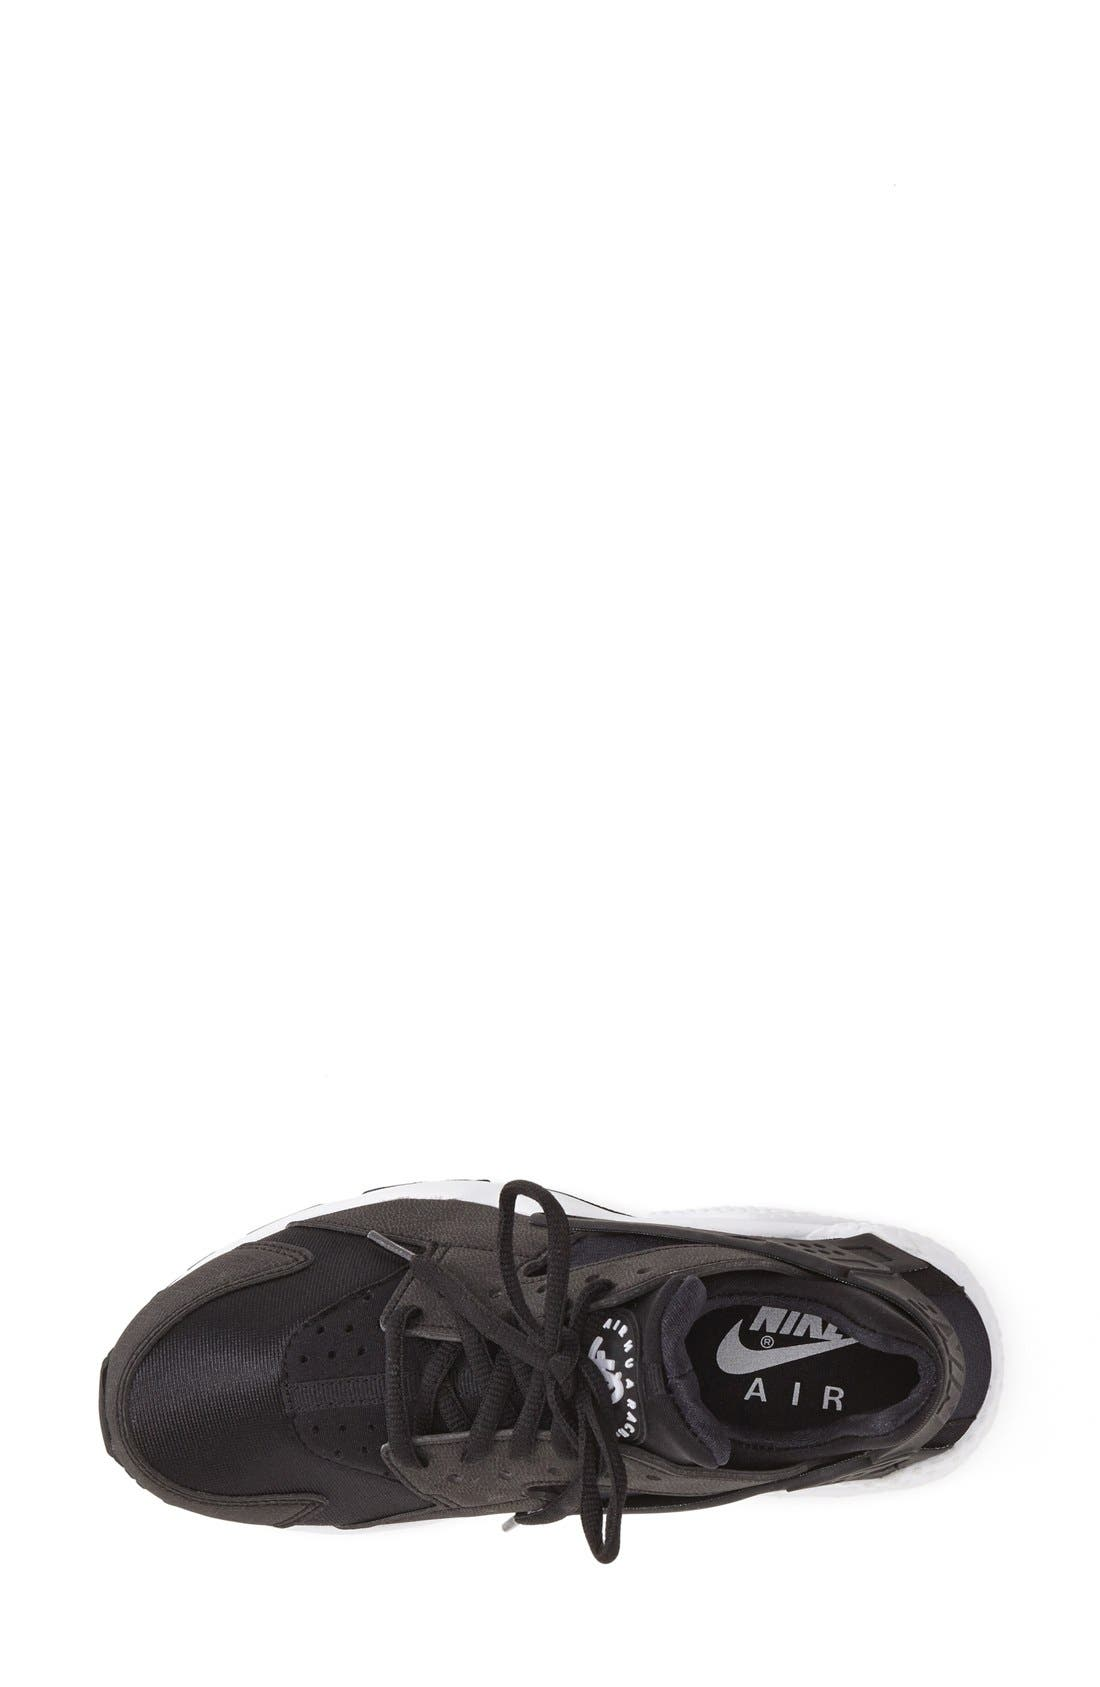 'Air Huarache' Sneaker,                             Alternate thumbnail 2, color,                             006